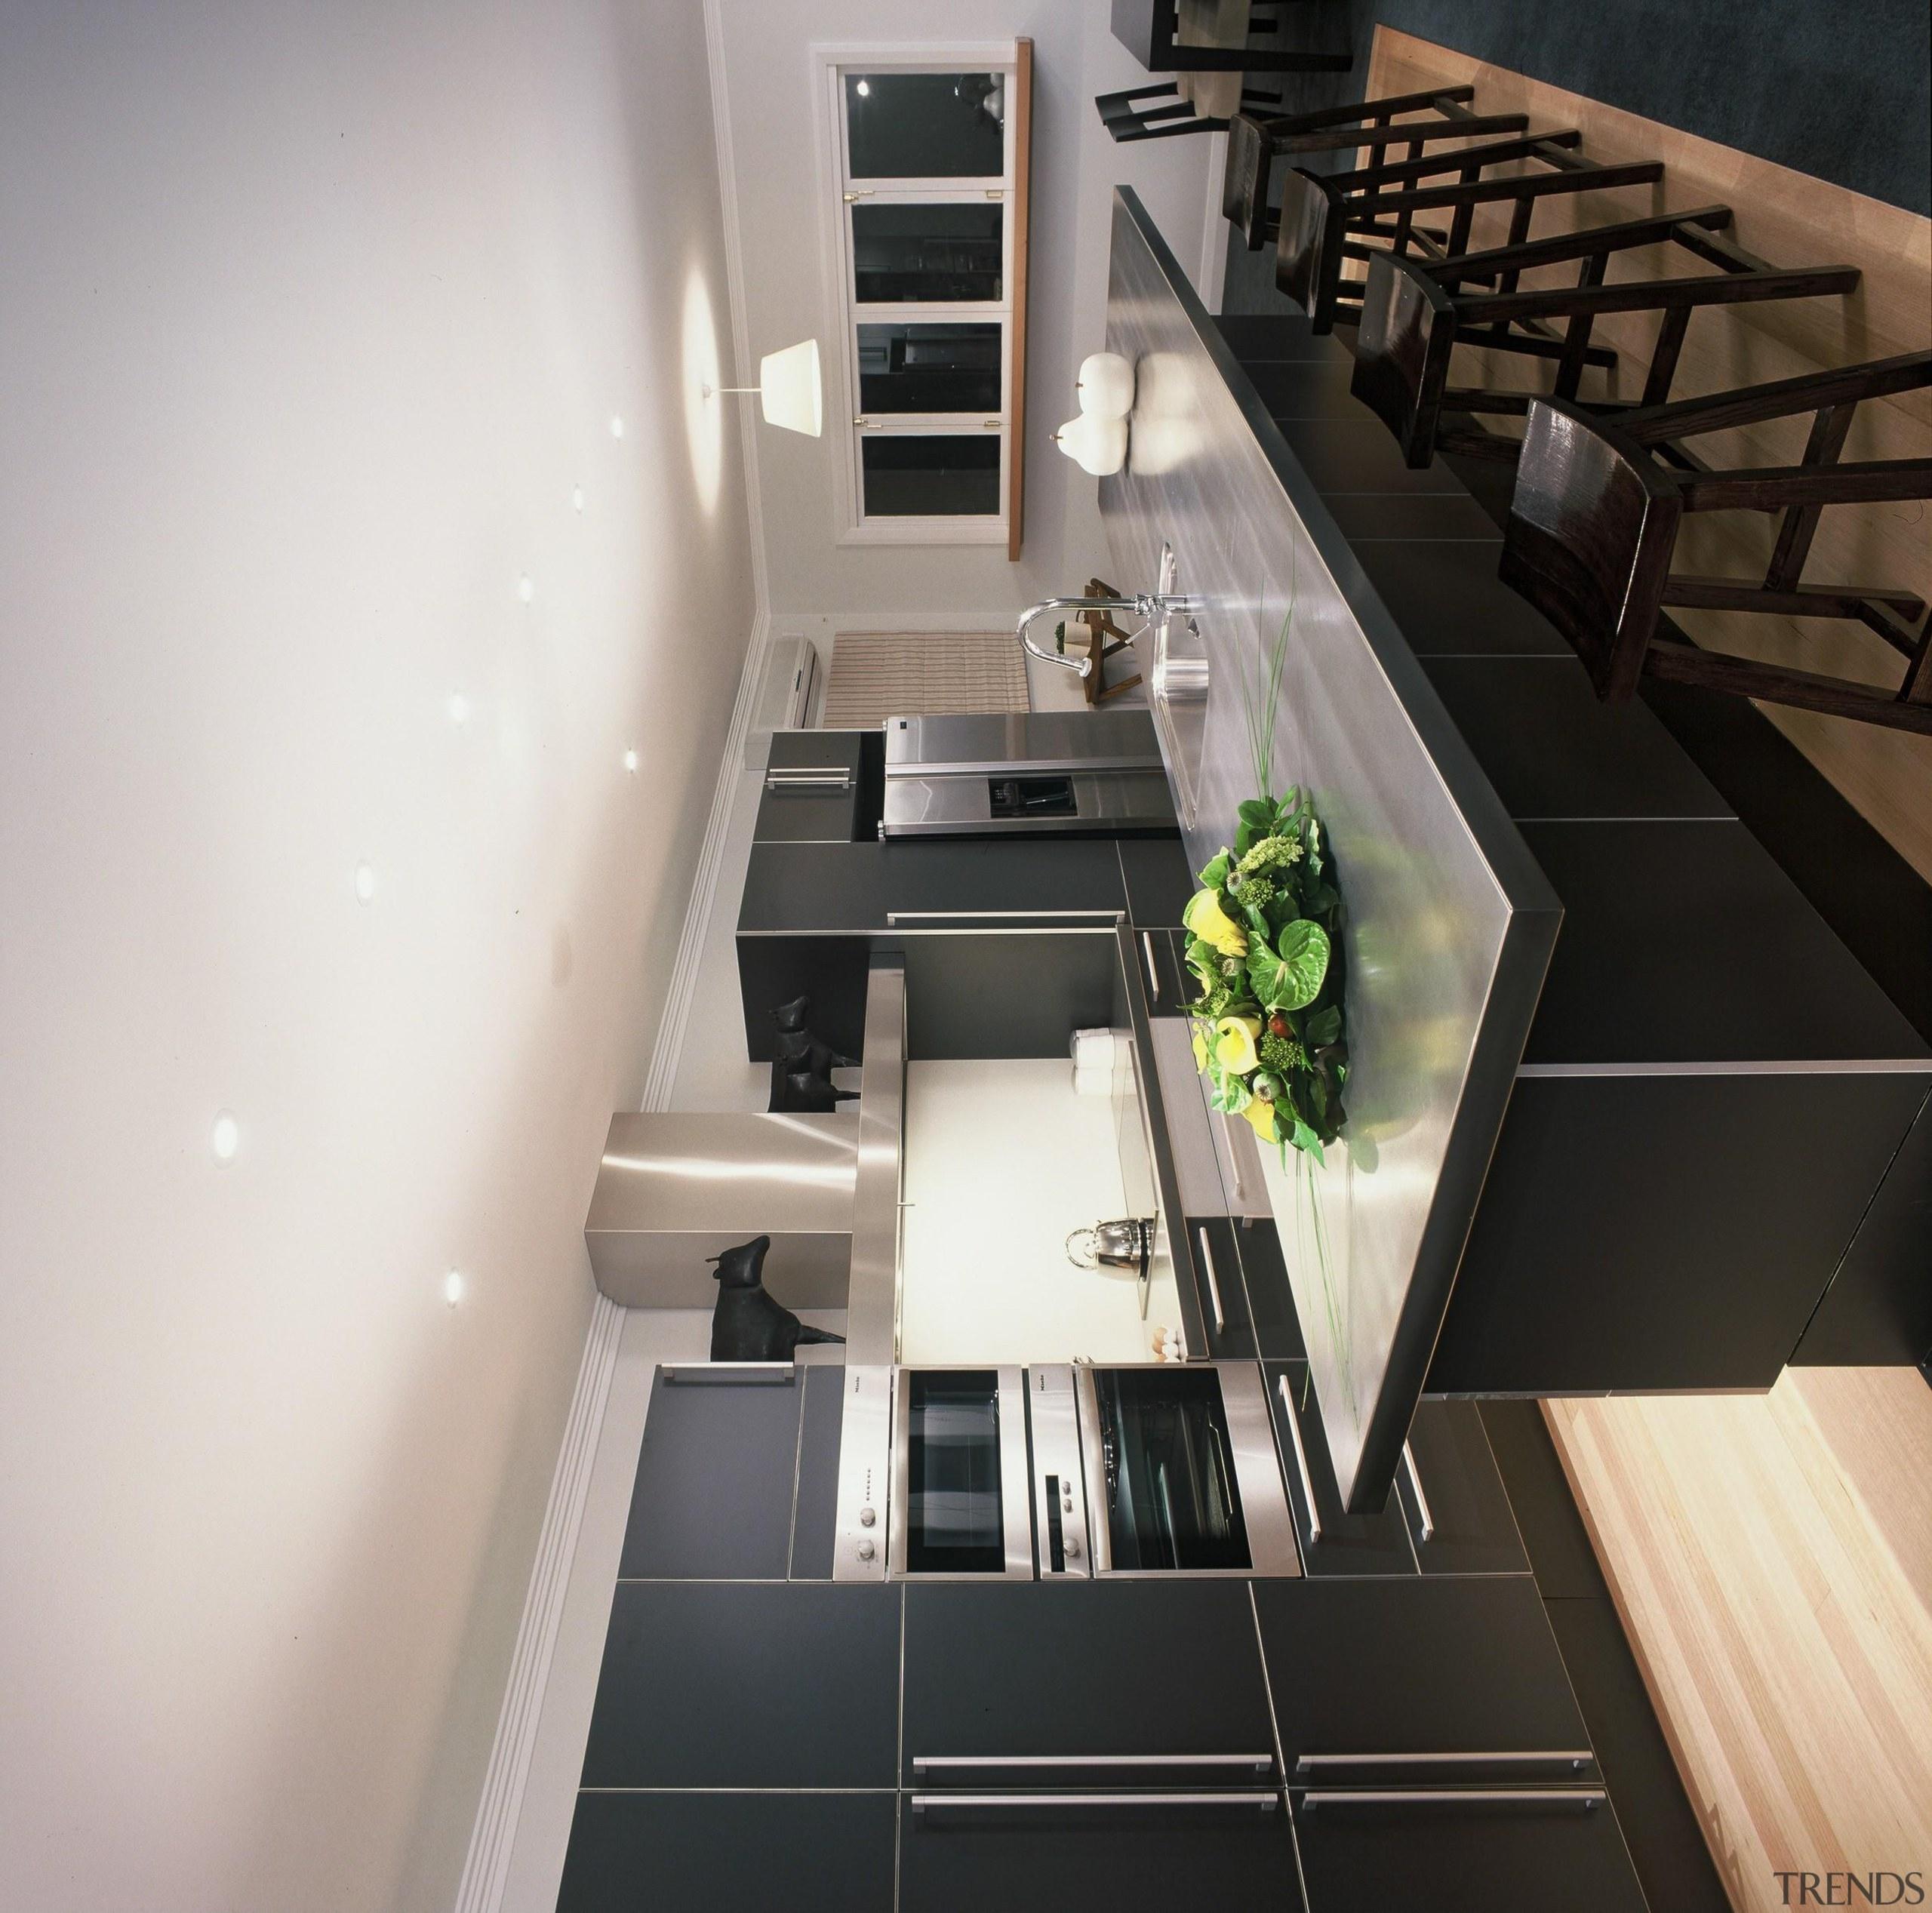 000003.jpg - architecture | countertop | floor | architecture, countertop, floor, house, interior design, gray, black